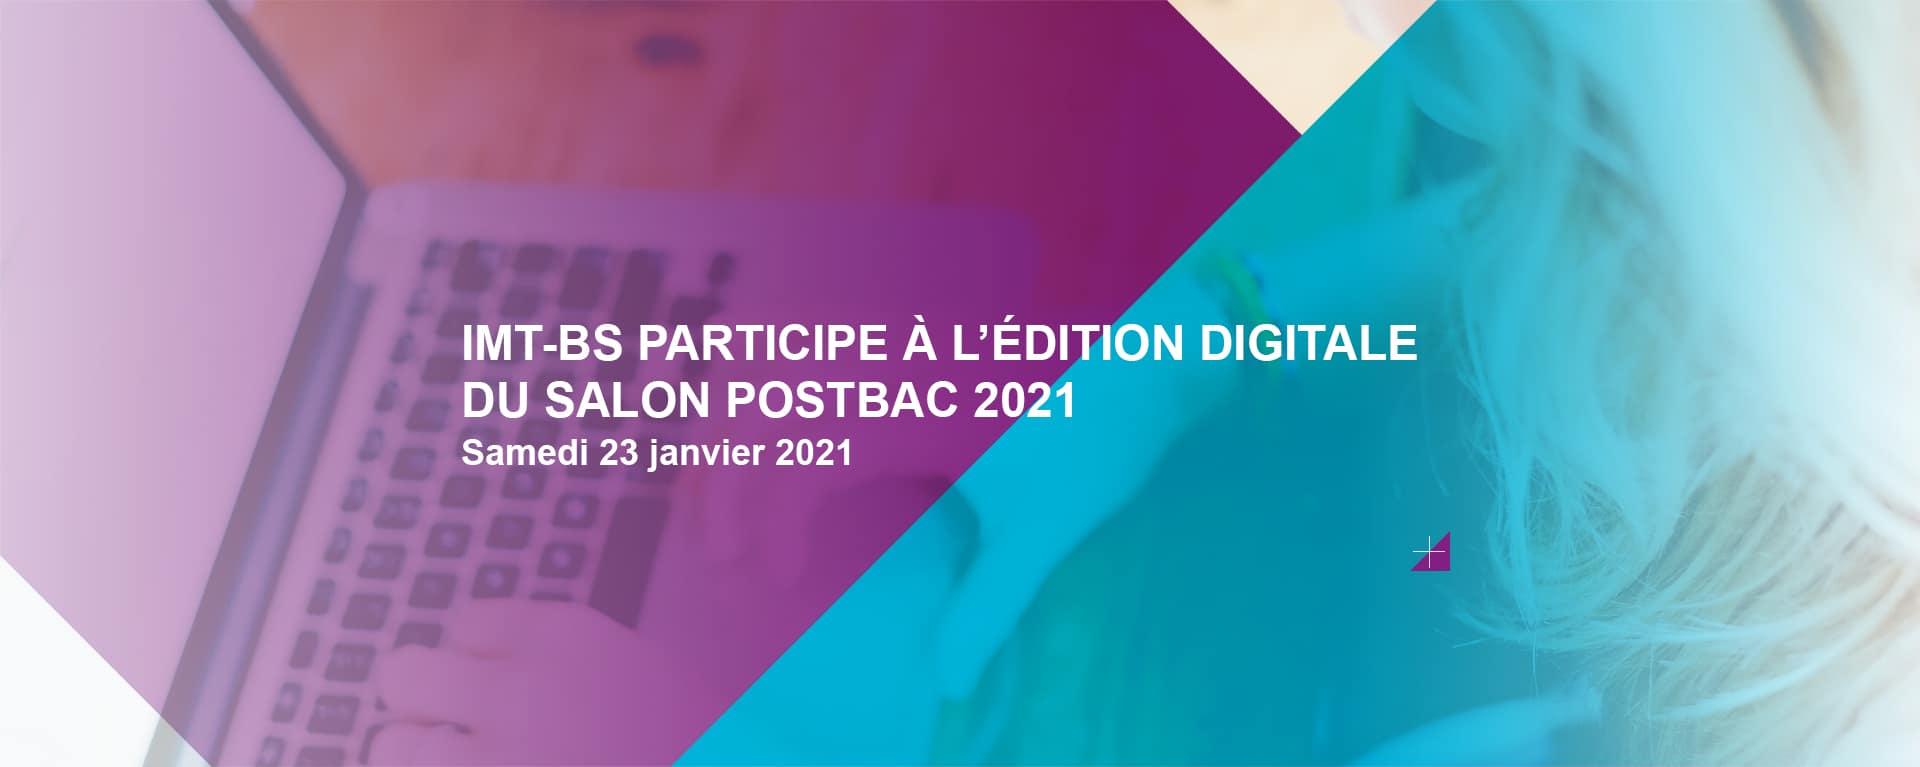 Salon Postbac 2021